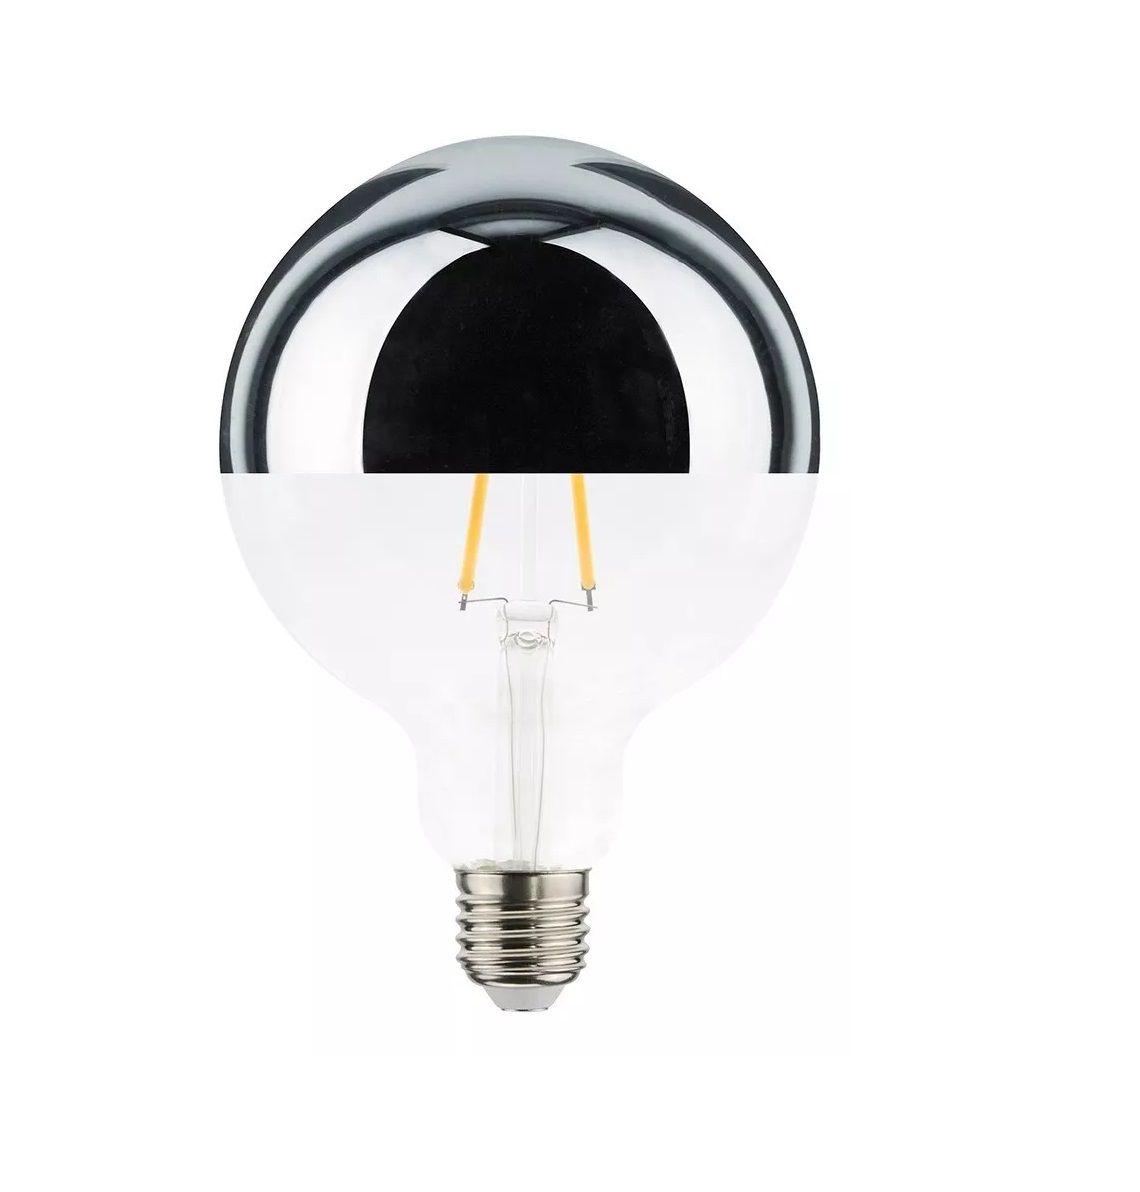 Lâmpada LED defletora G125 6w BIVOLT  - ZOLT luminárias